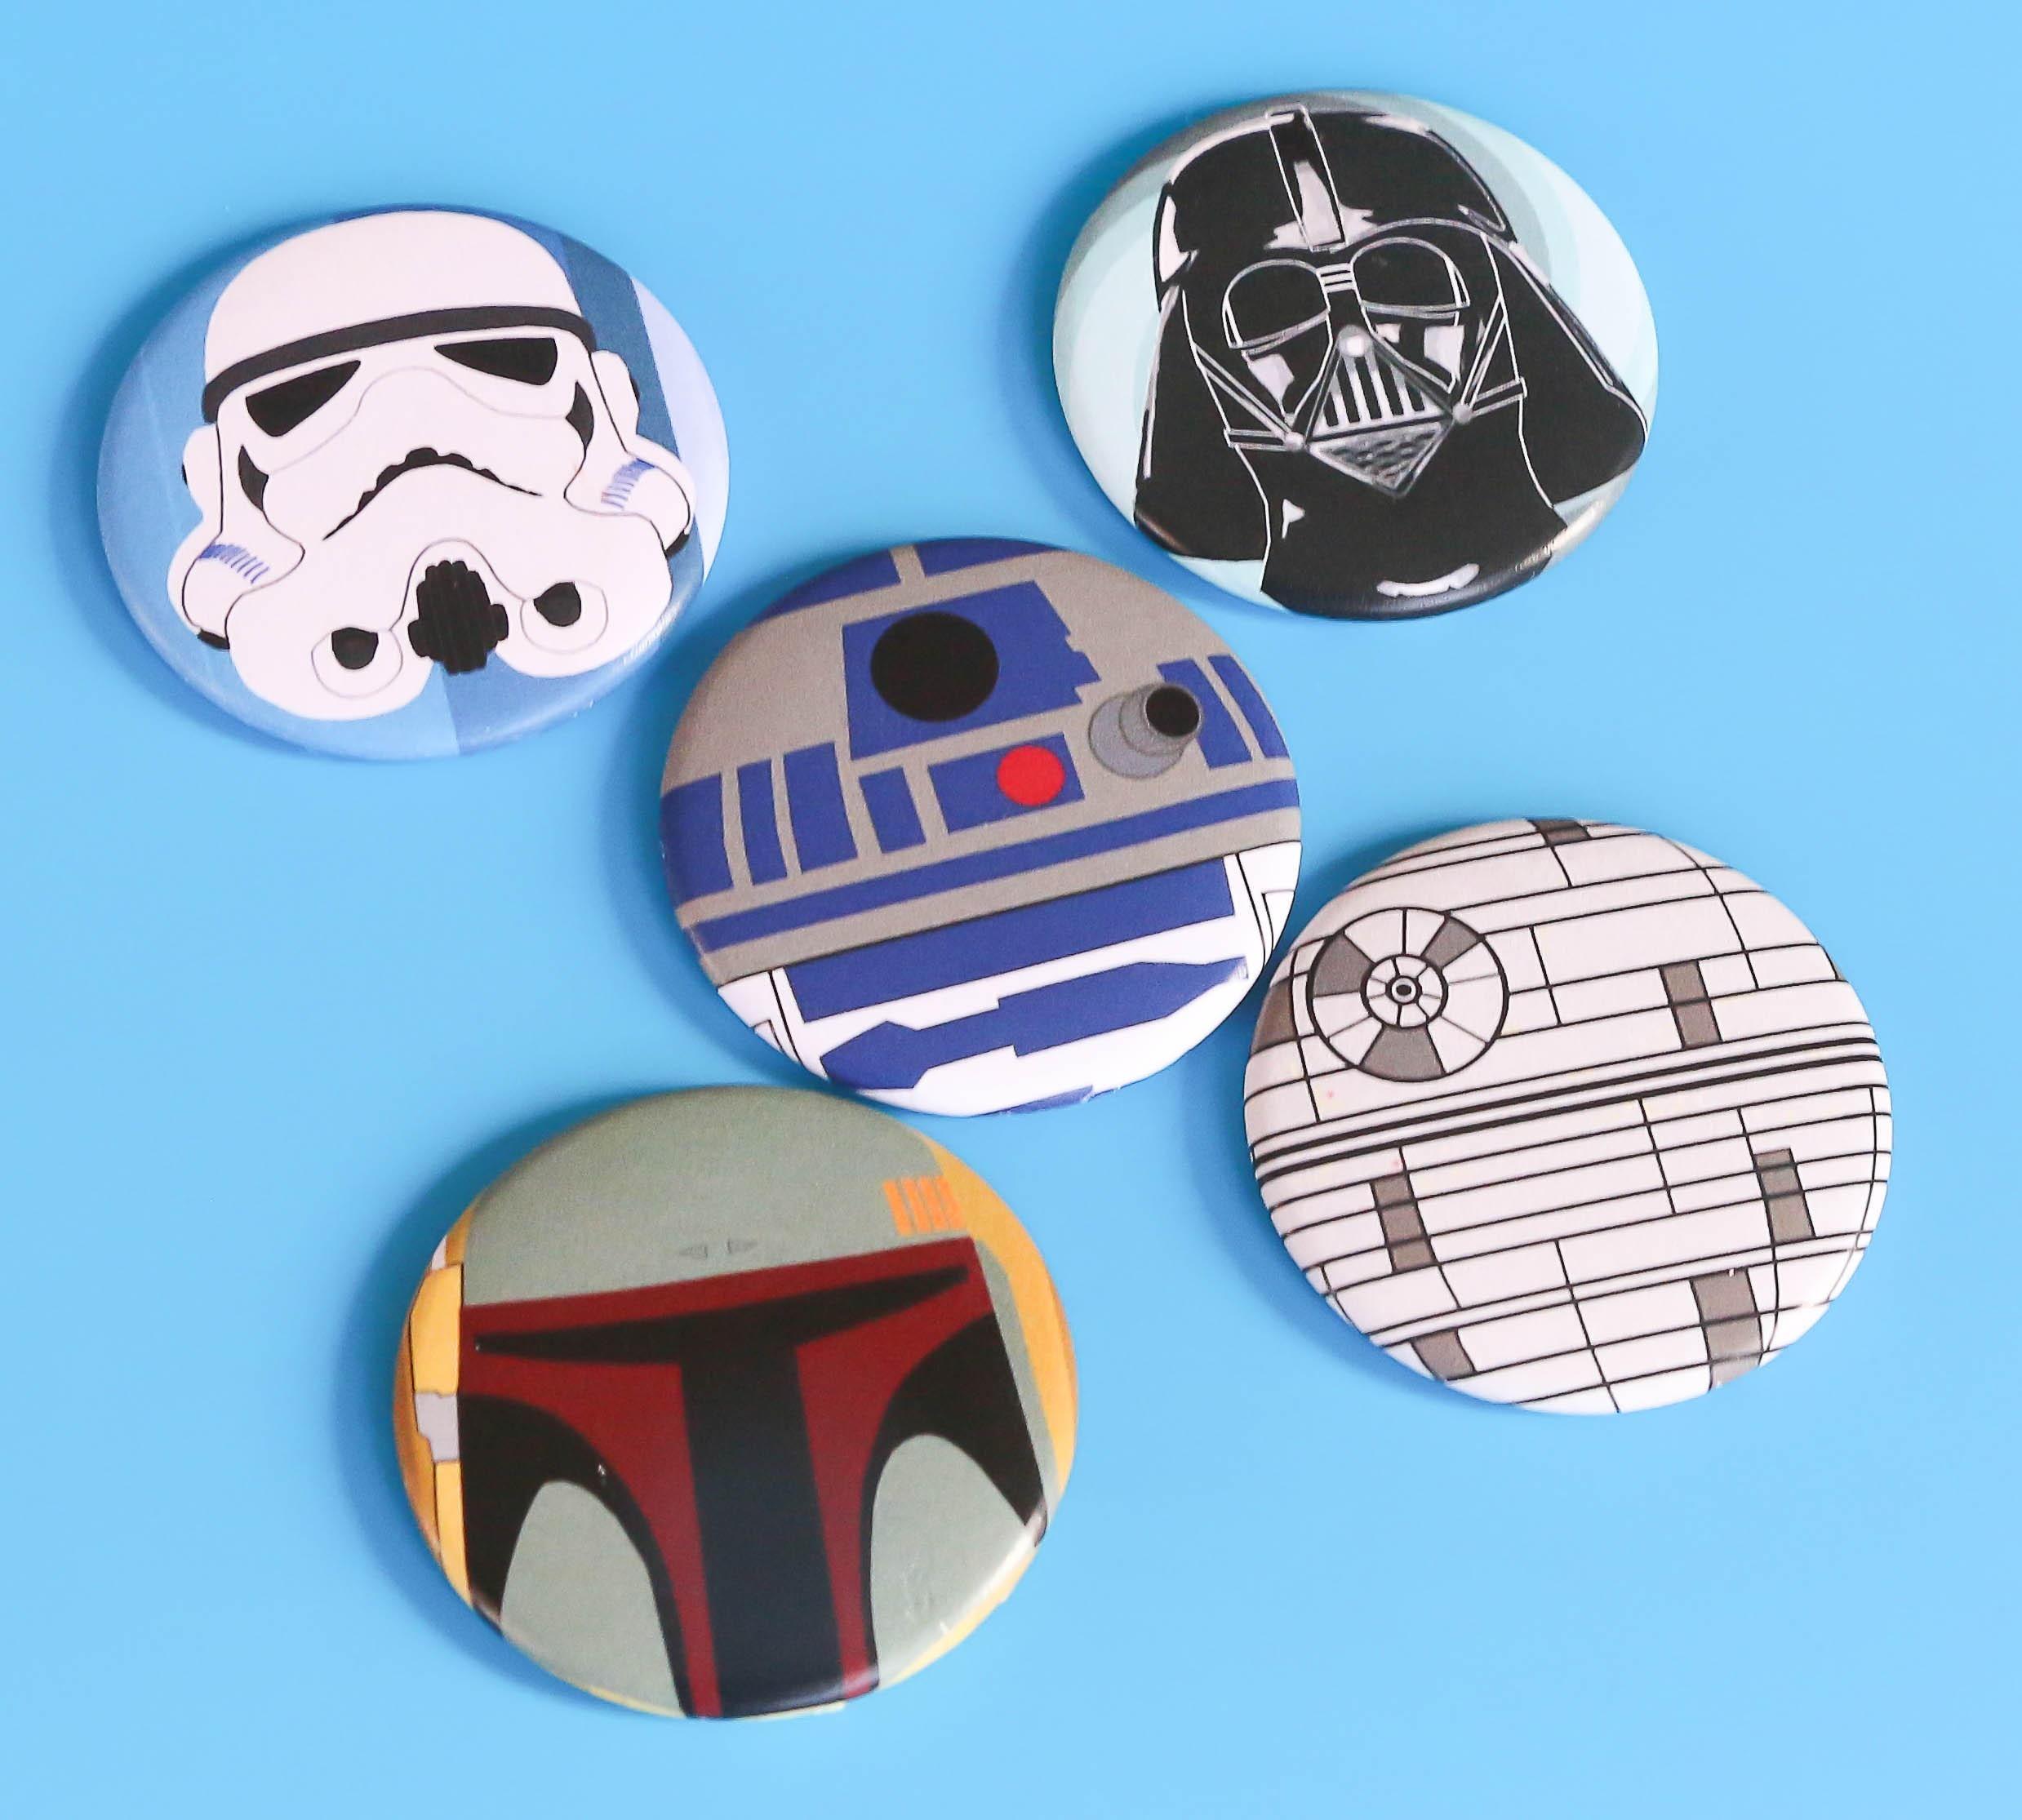 Star Wars Magnet Set Sci Fi Magnets Darth Vadar R2d2